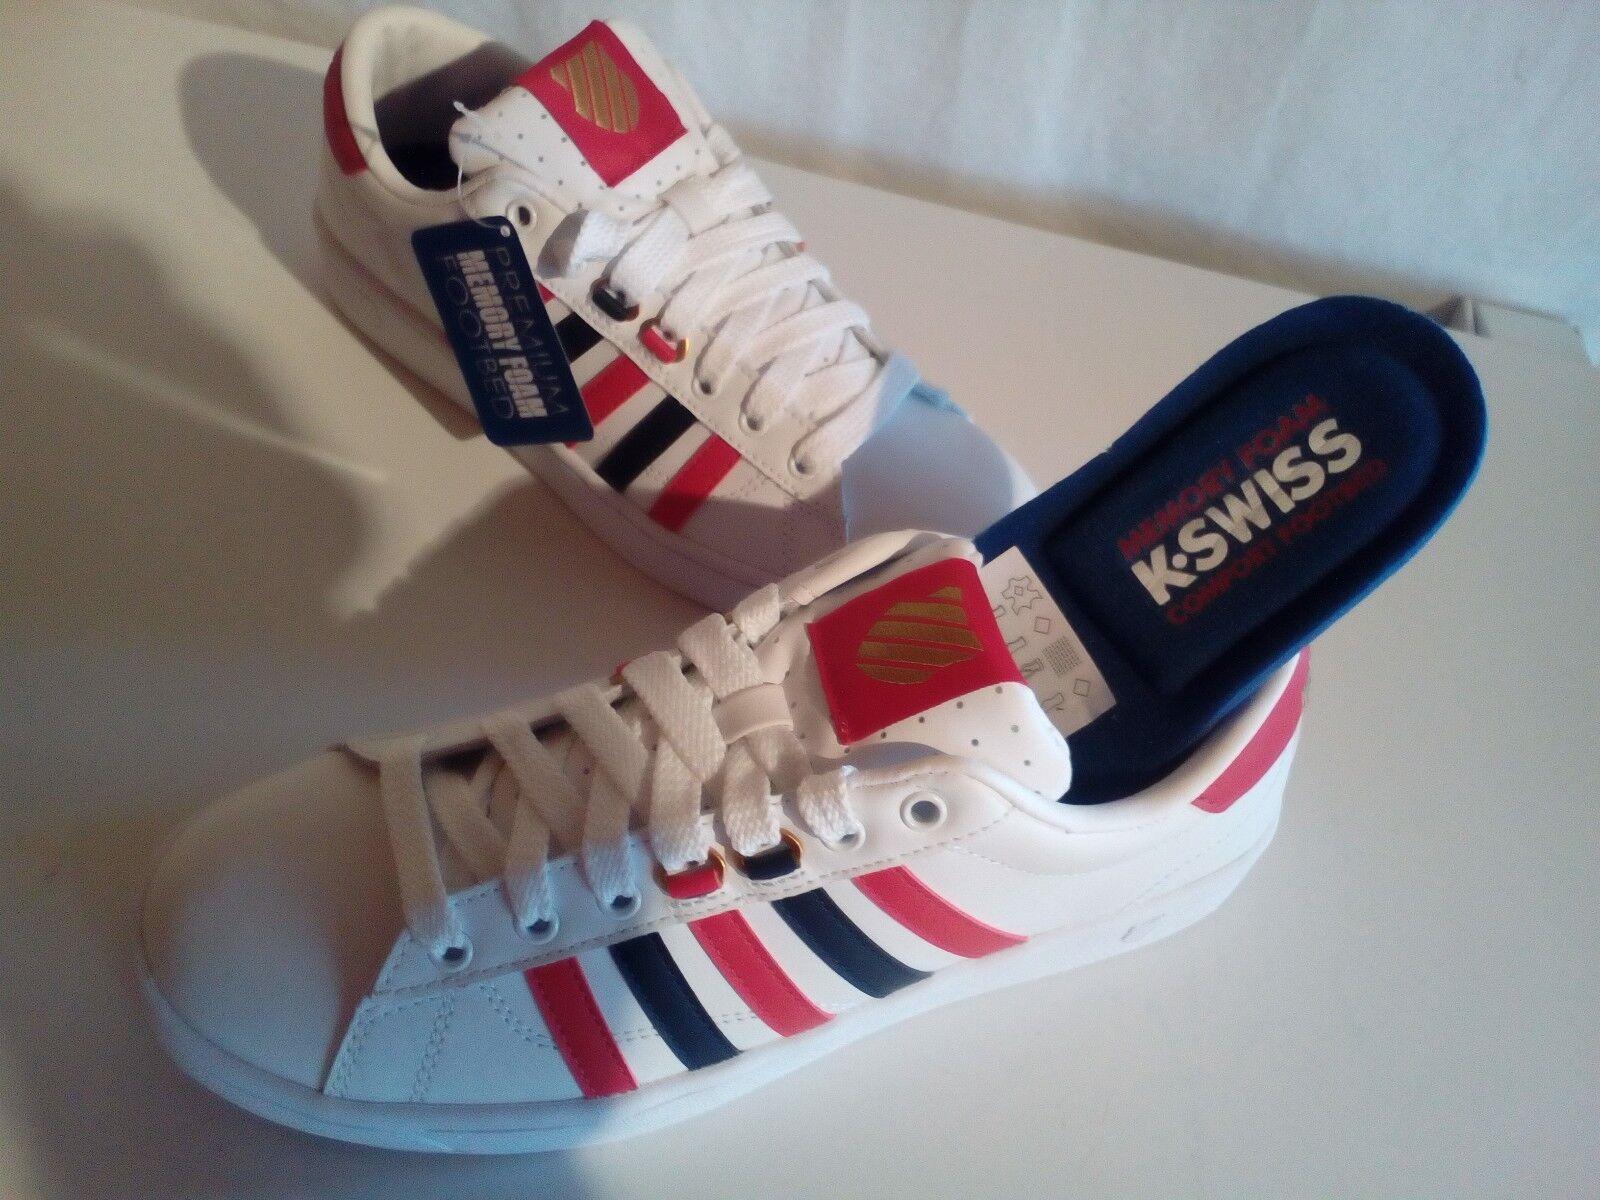 K-Swiss hoke CMF cuero calzado deportivo deportivo deportivo casual blanco-azul-rojo tamaño 40-41 nuevo 2aa843